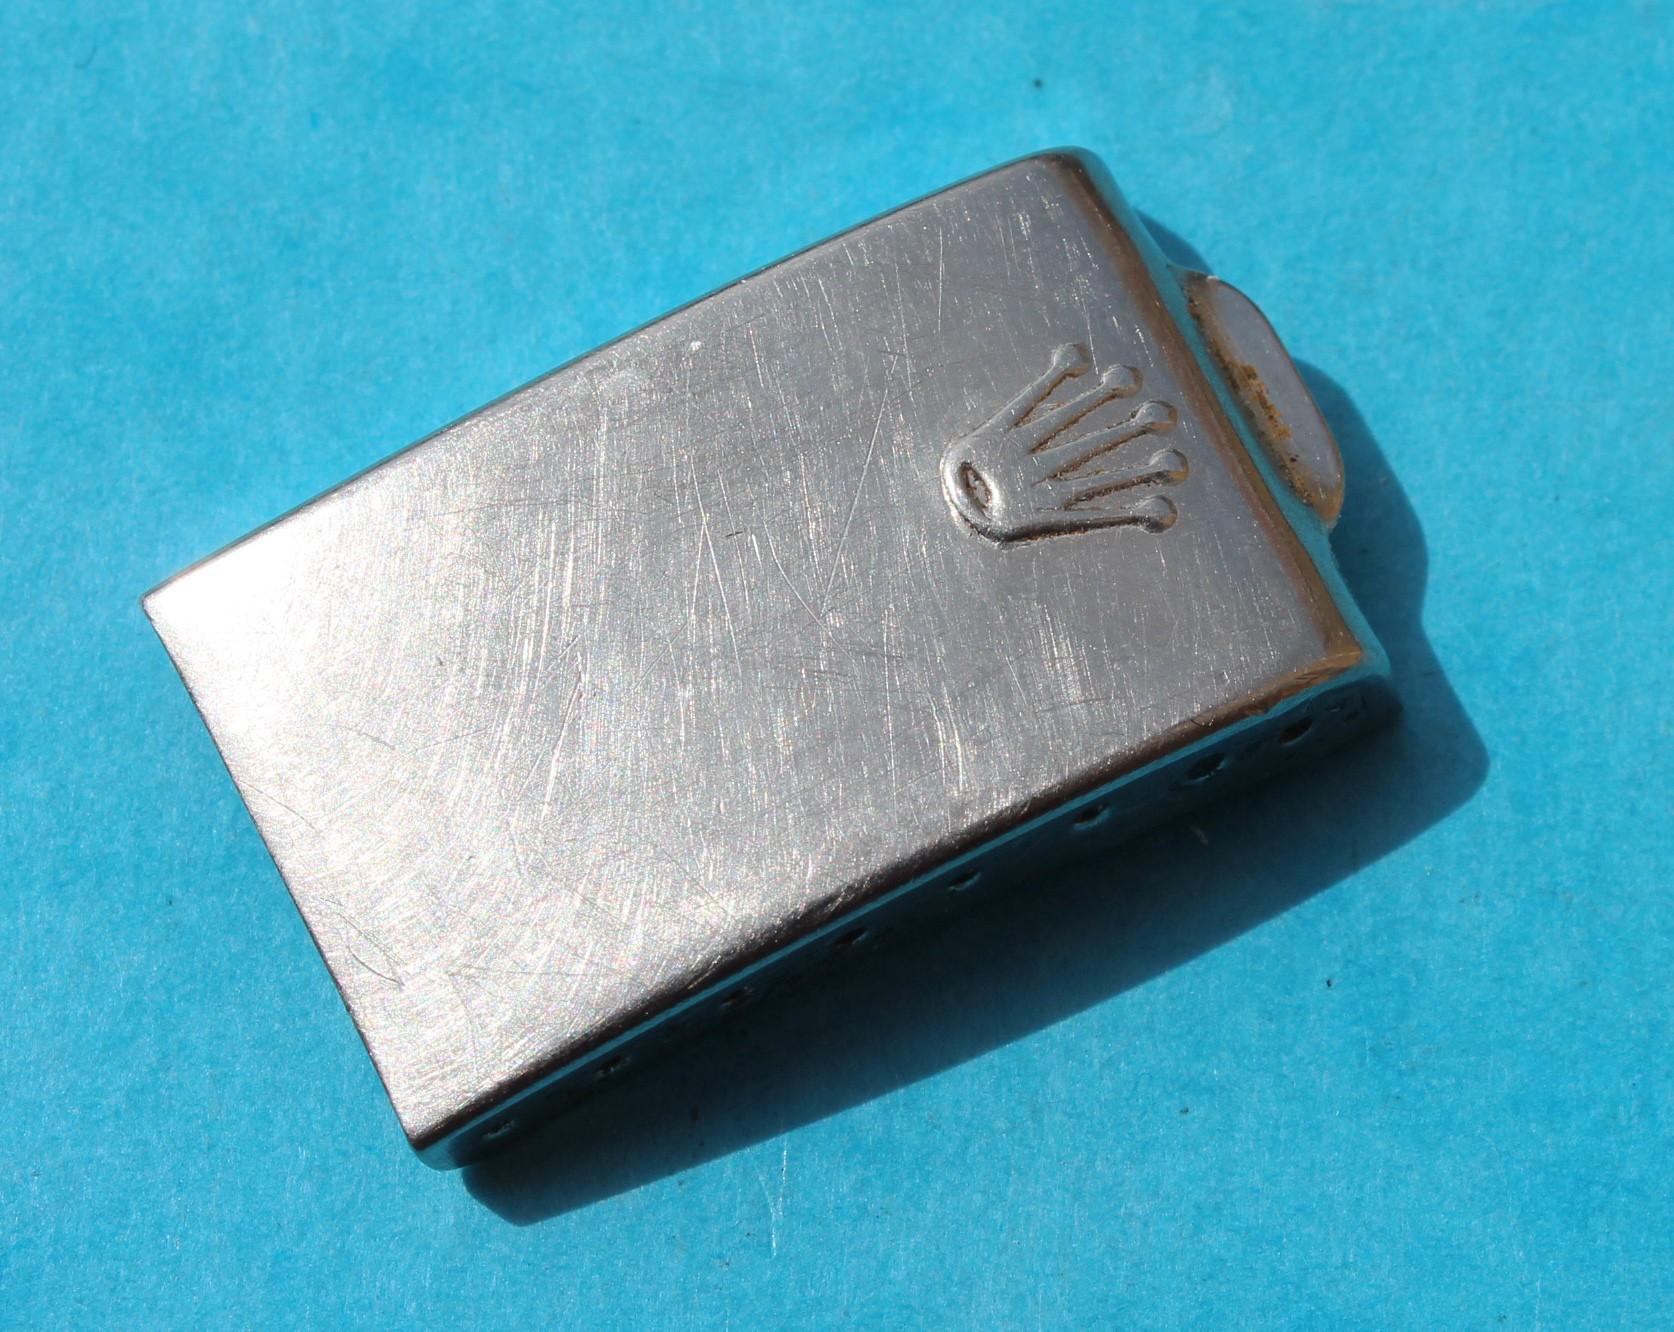 FERMOIR BOUCLIER ref 7836 / 6251H BRACELET PLIE OYSTER / JUBILEE GMT MASTER 1675, 1655, 1016, 1019